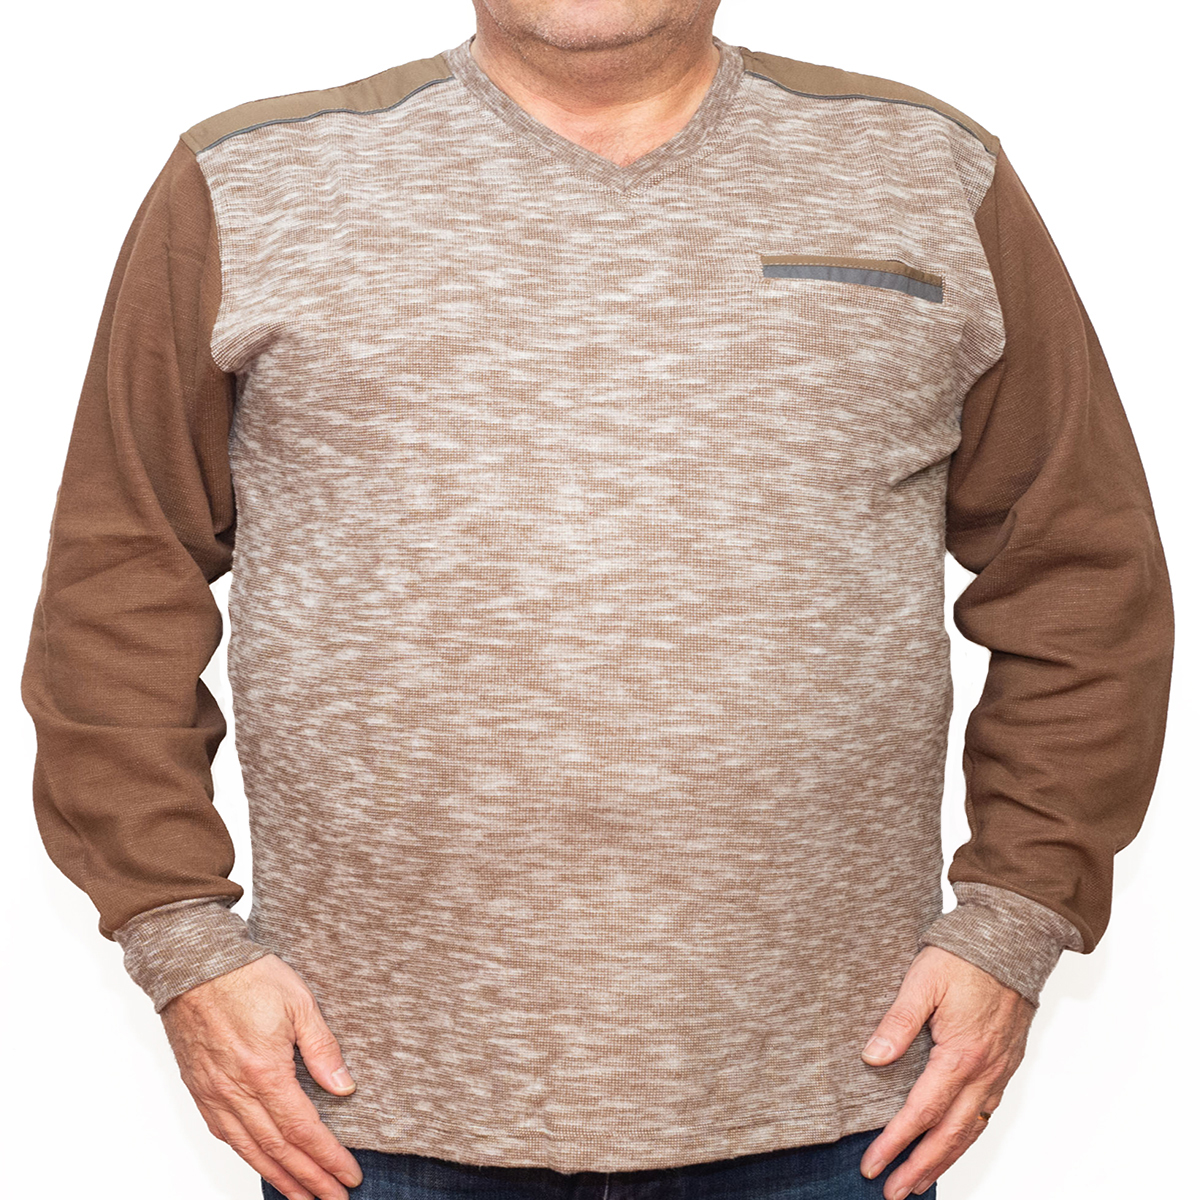 Bluza groasa maro cu imprimeu si cu anchior, Marime 6XL - egato.ro